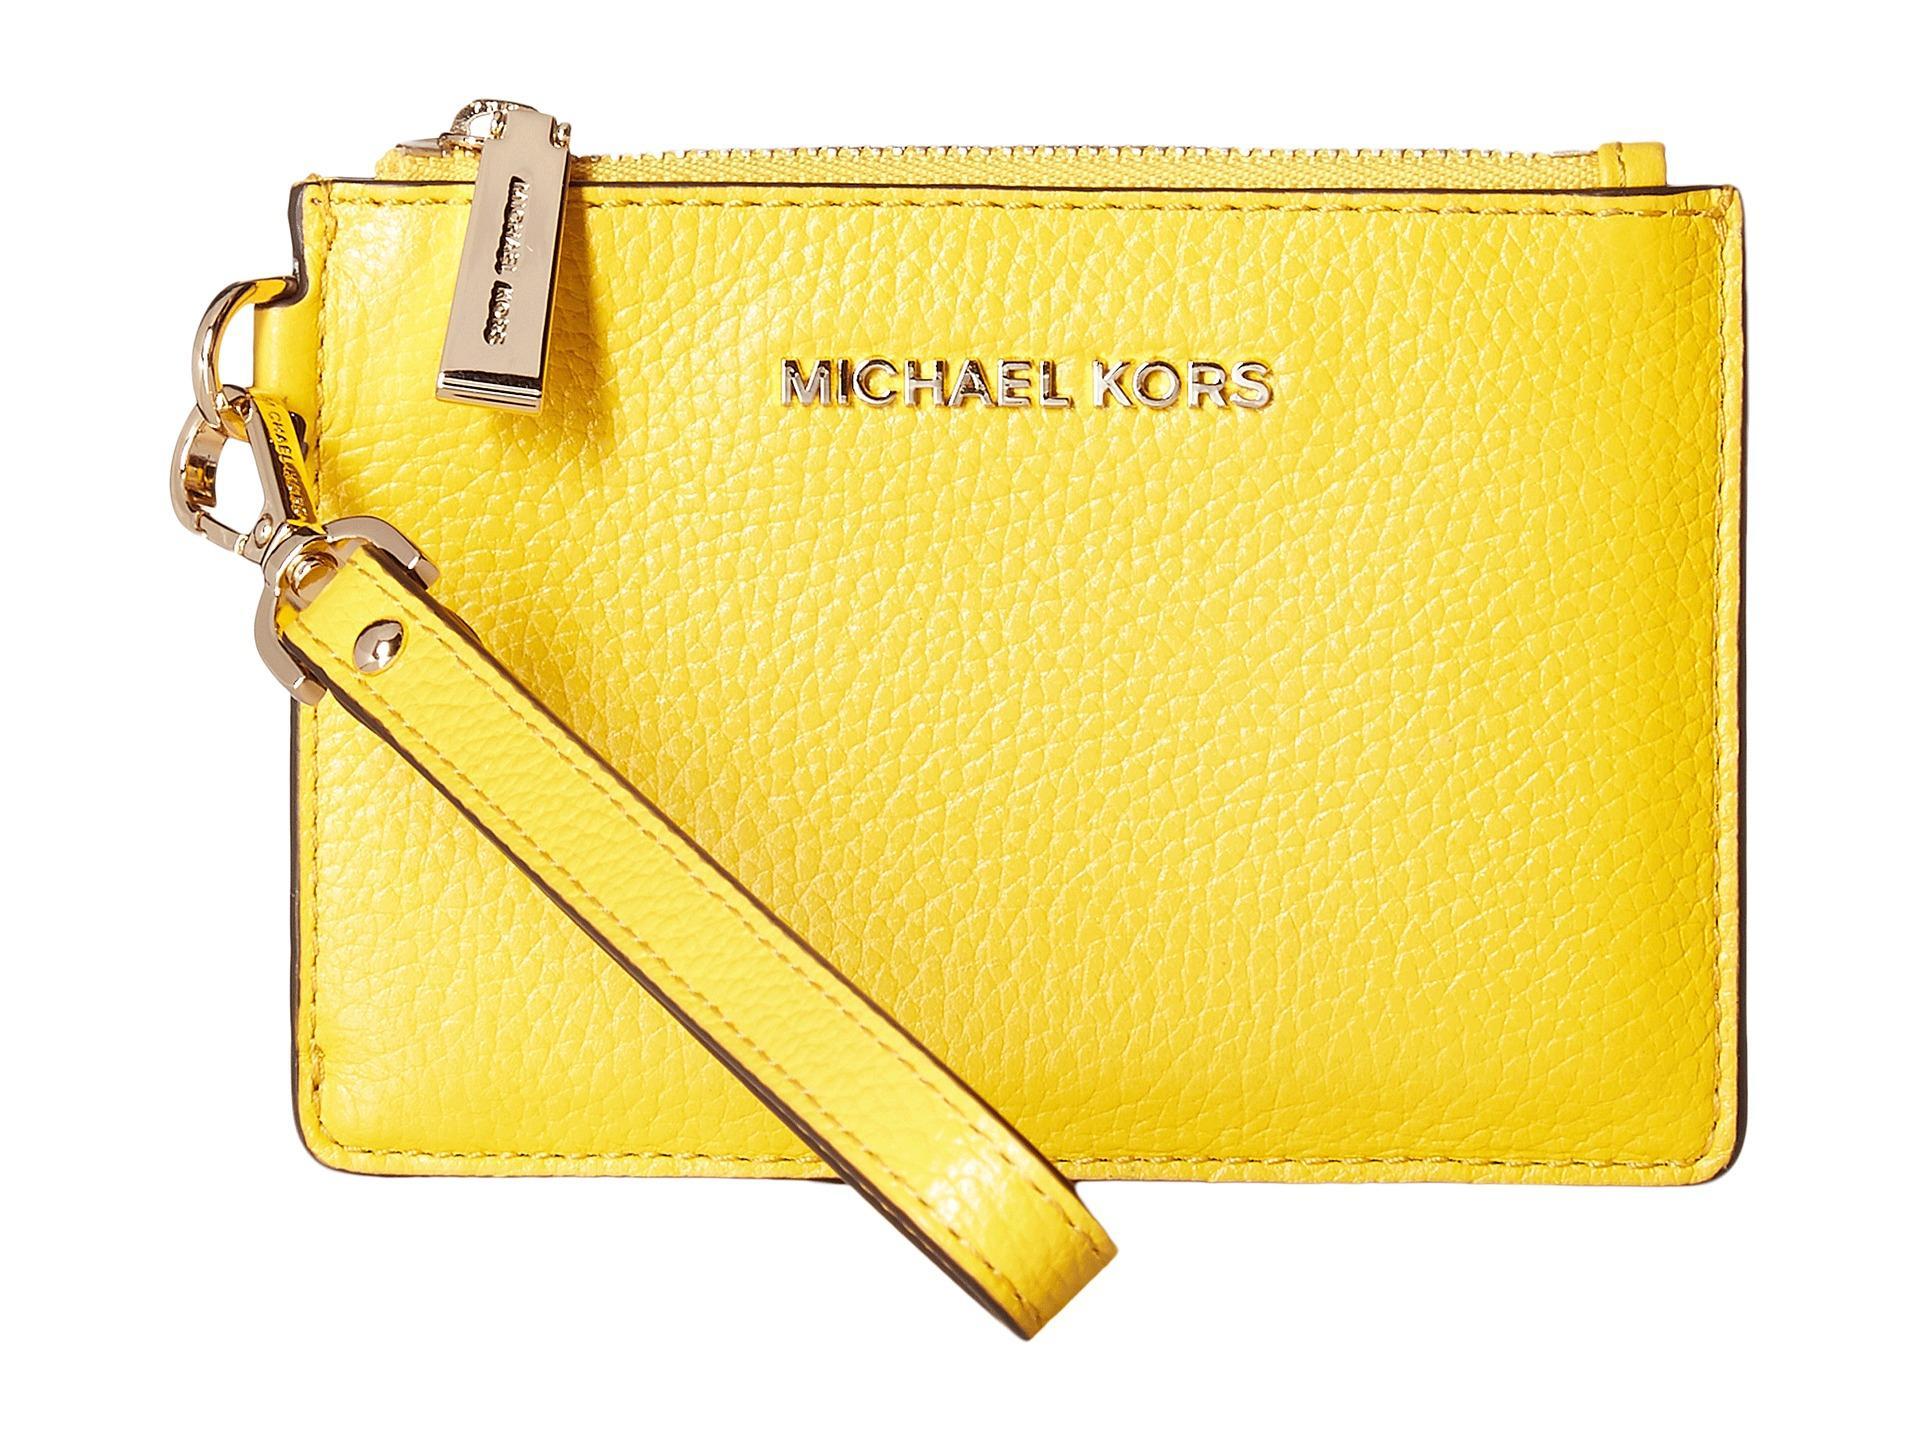 1ff0b8046142a4 MICHAEL Michael Kors Mercer Small Coin Purse in Yellow - Lyst